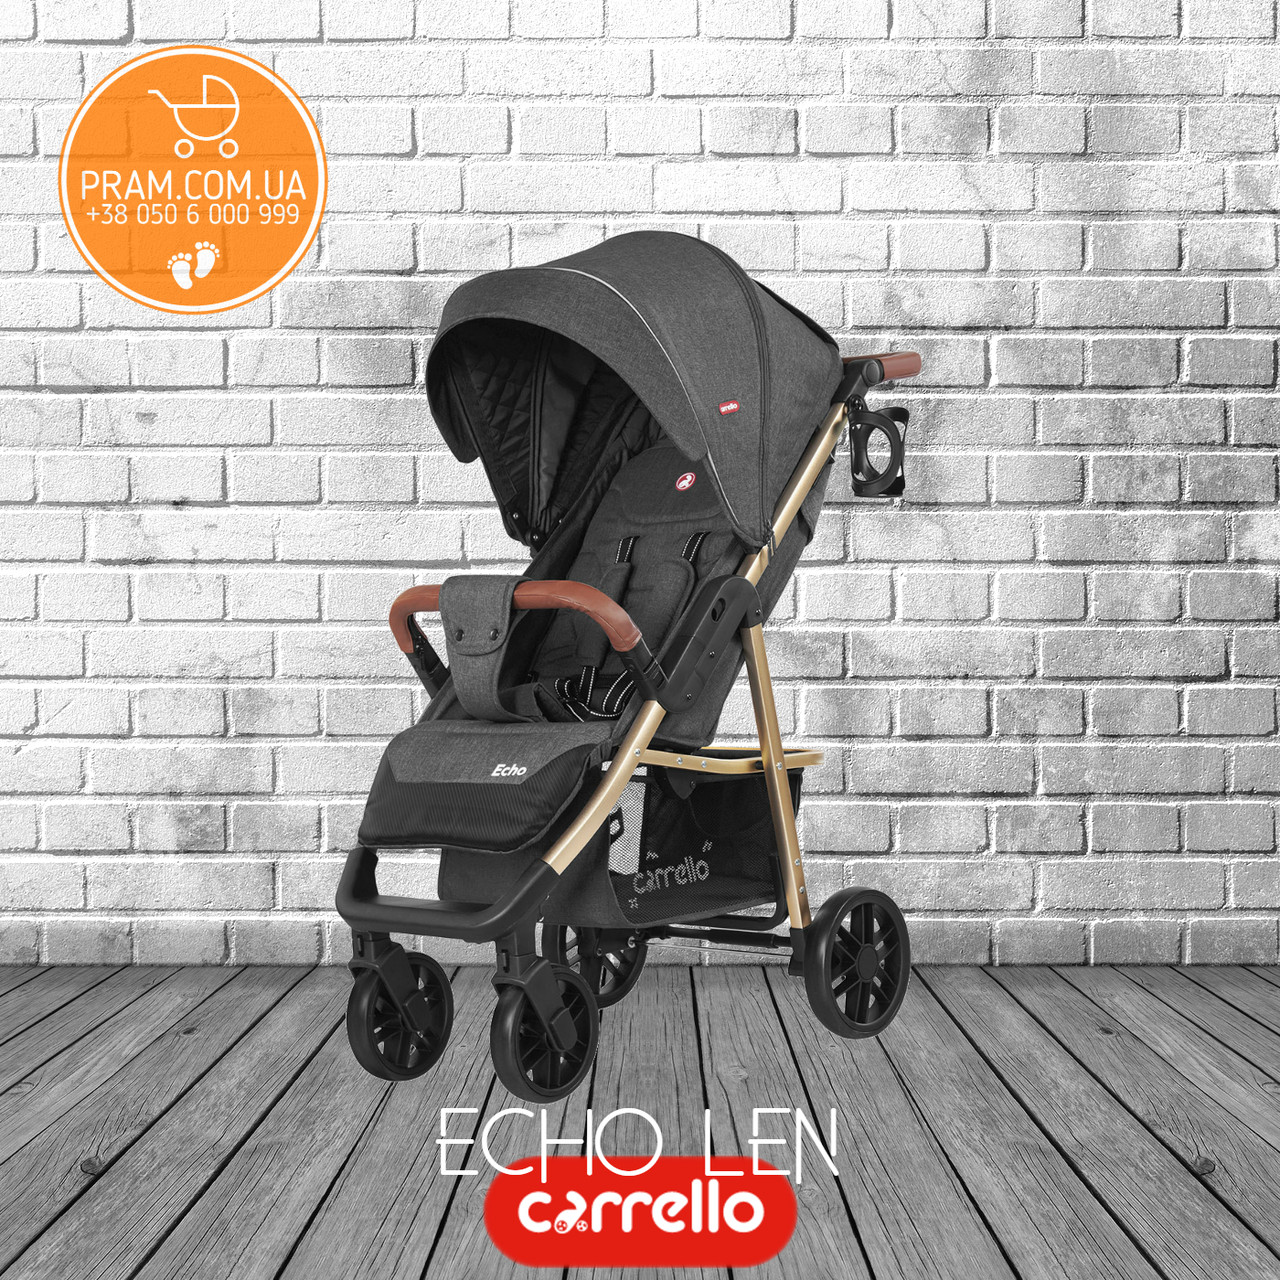 CARRELLO Echo CRL-8508/1 Len прогулочная коляска Midnight Gray Темно-серый